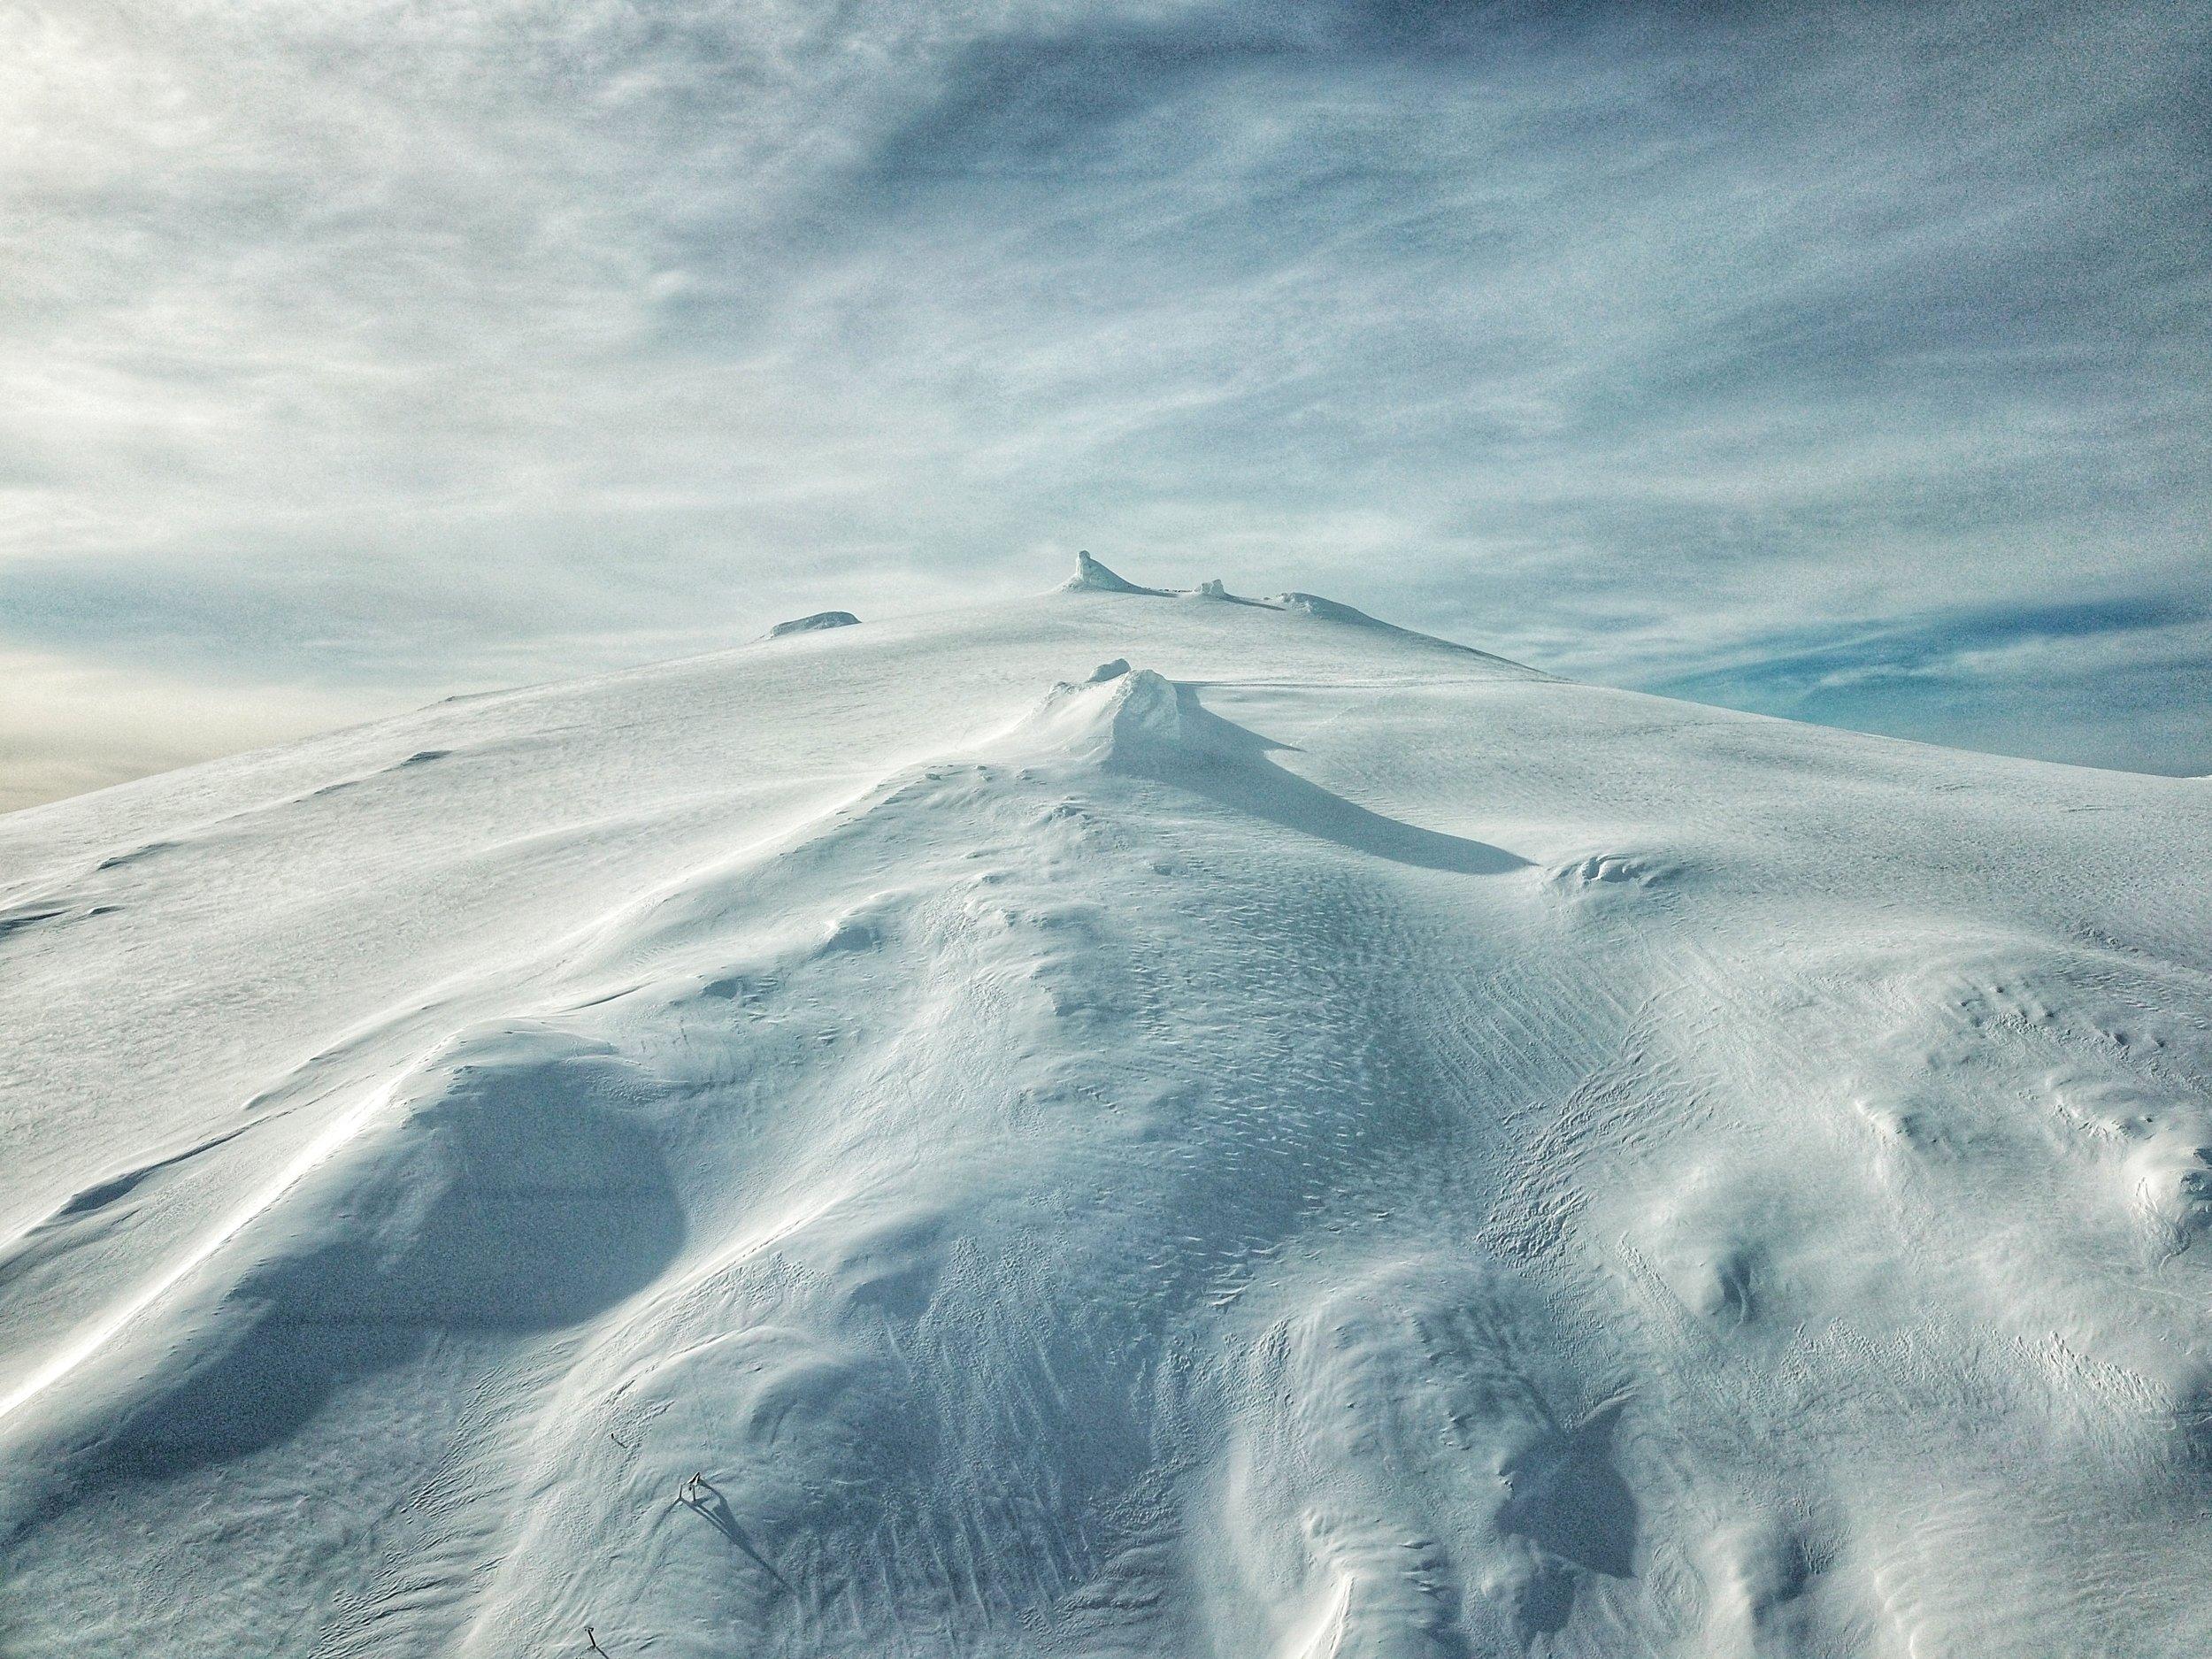 snæfellsjökull drone photography